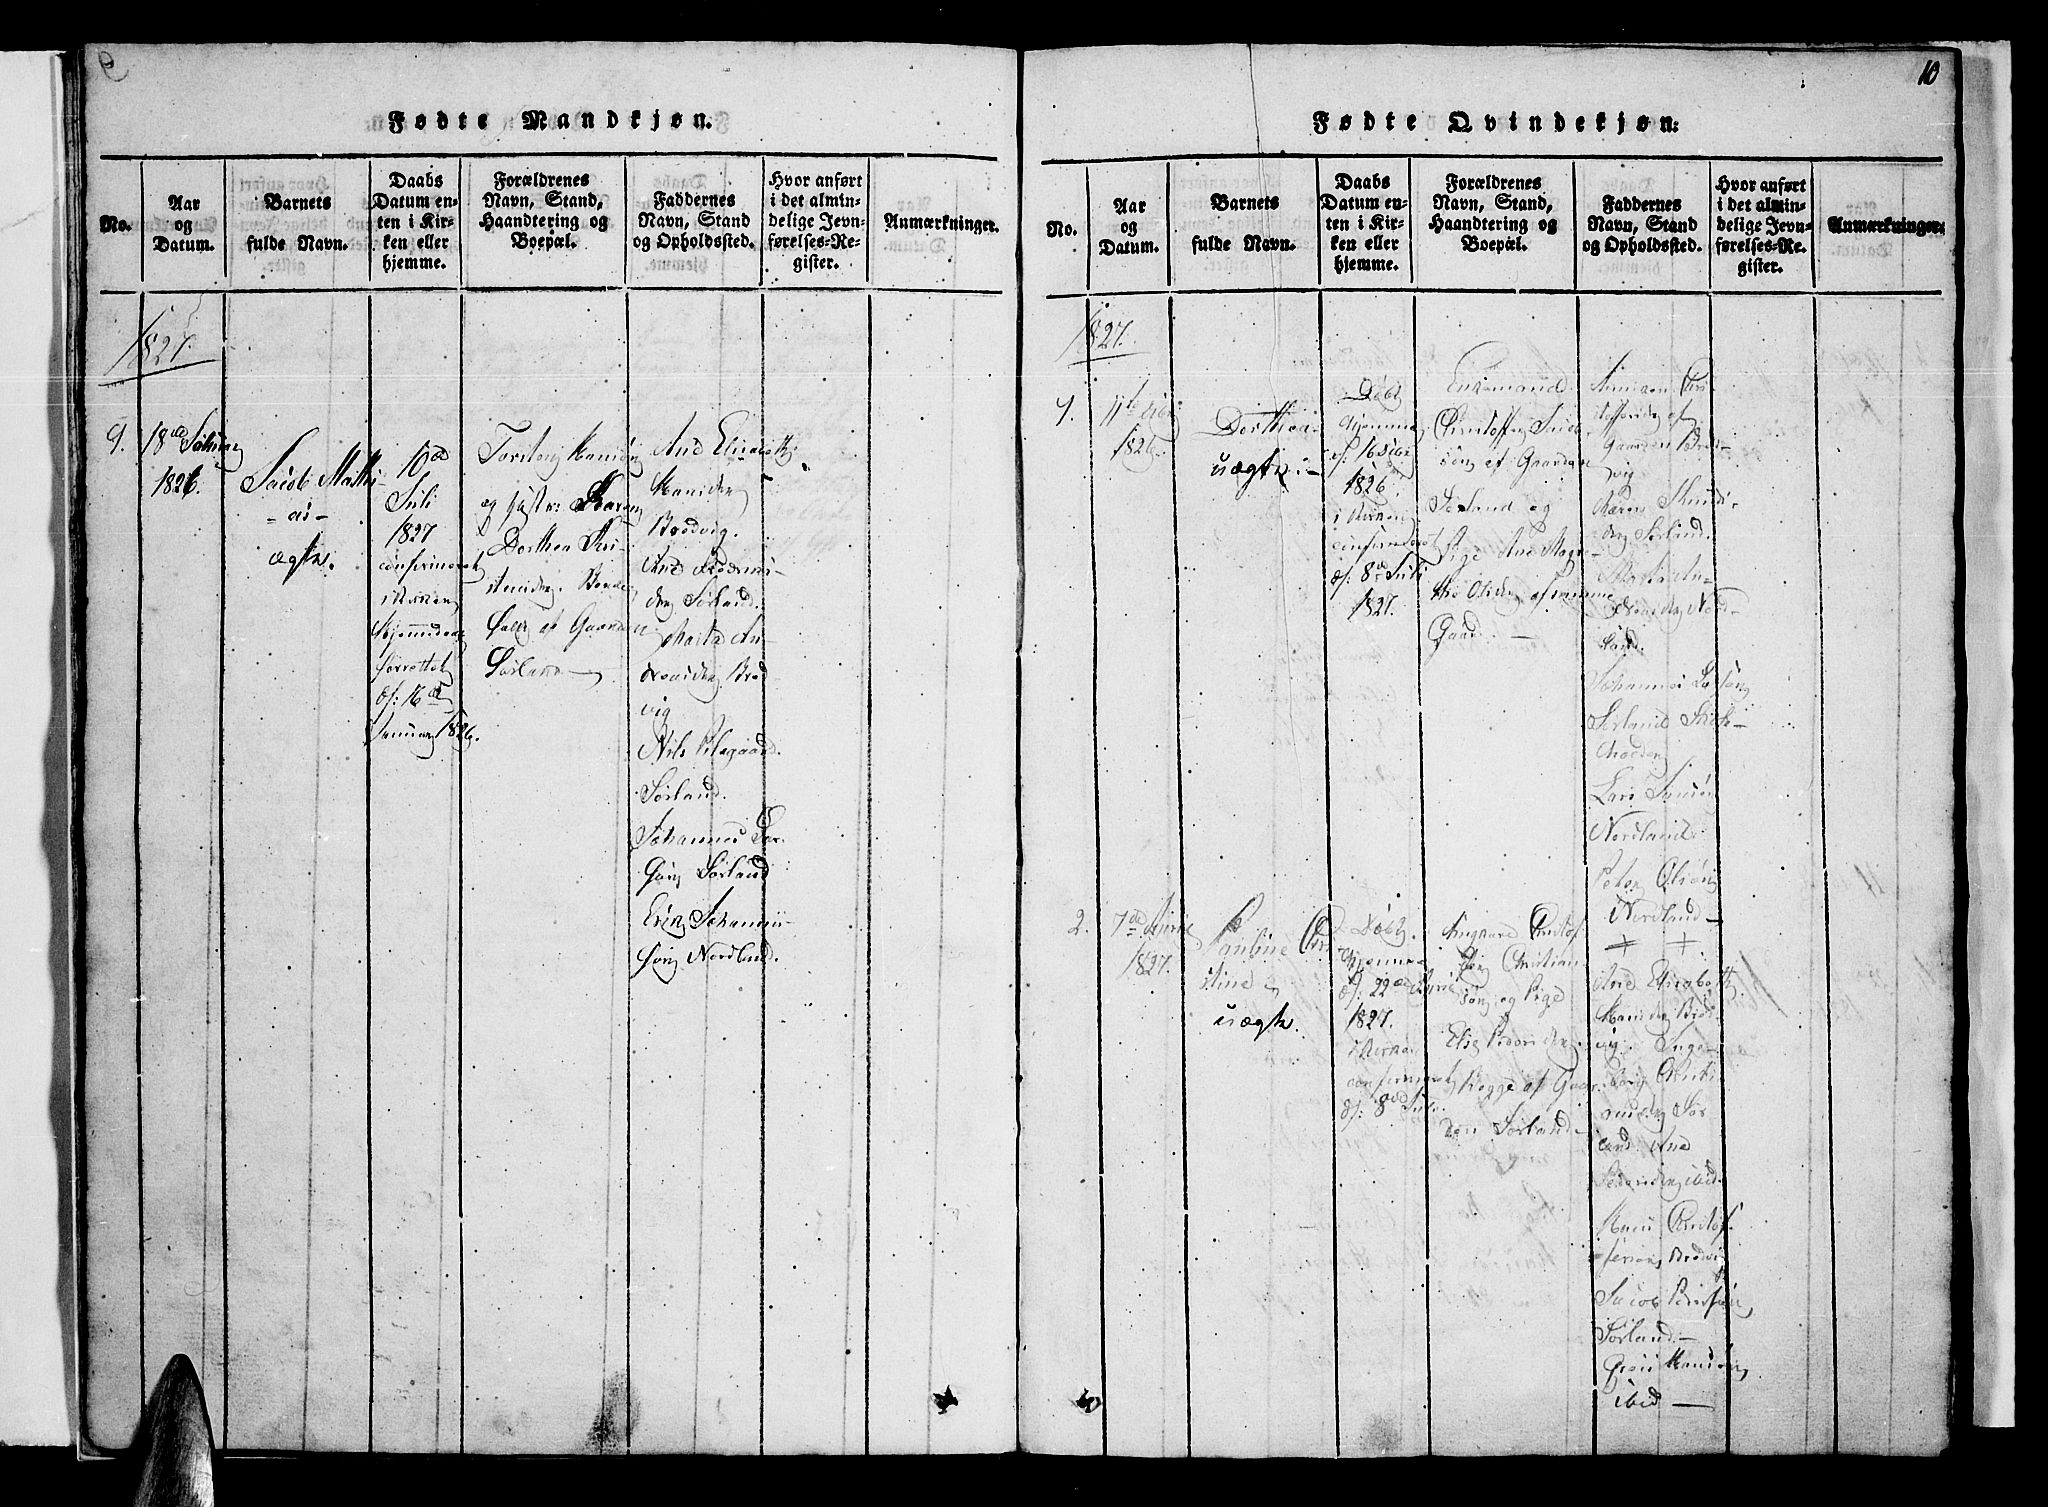 SAT, Ministerialprotokoller, klokkerbøker og fødselsregistre - Nordland, 807/L0120: Ministerialbok nr. 807A03, 1821-1848, s. 10